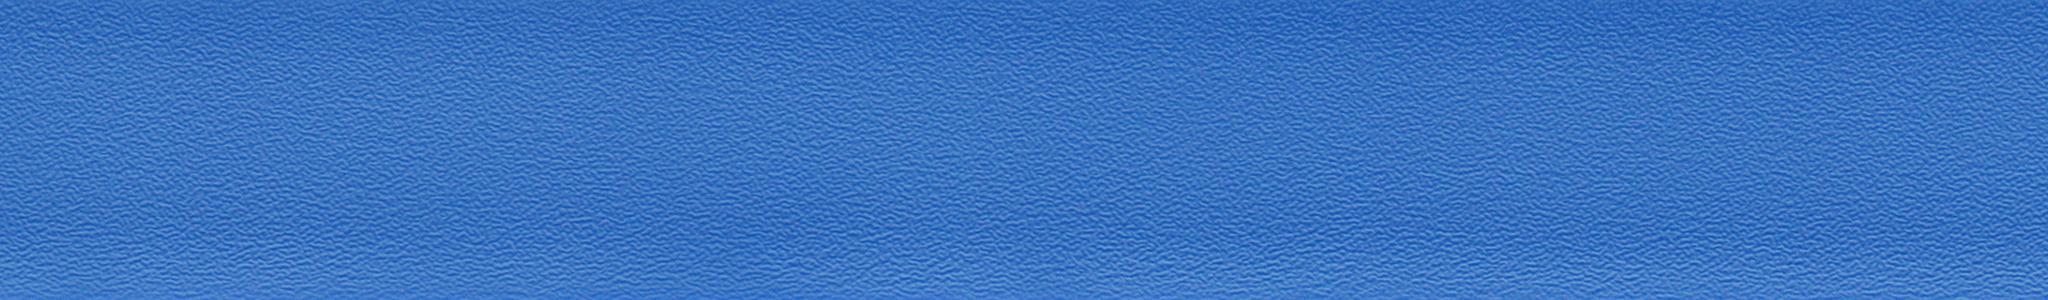 HU 15125 Chant ABS Bleu Perle 101